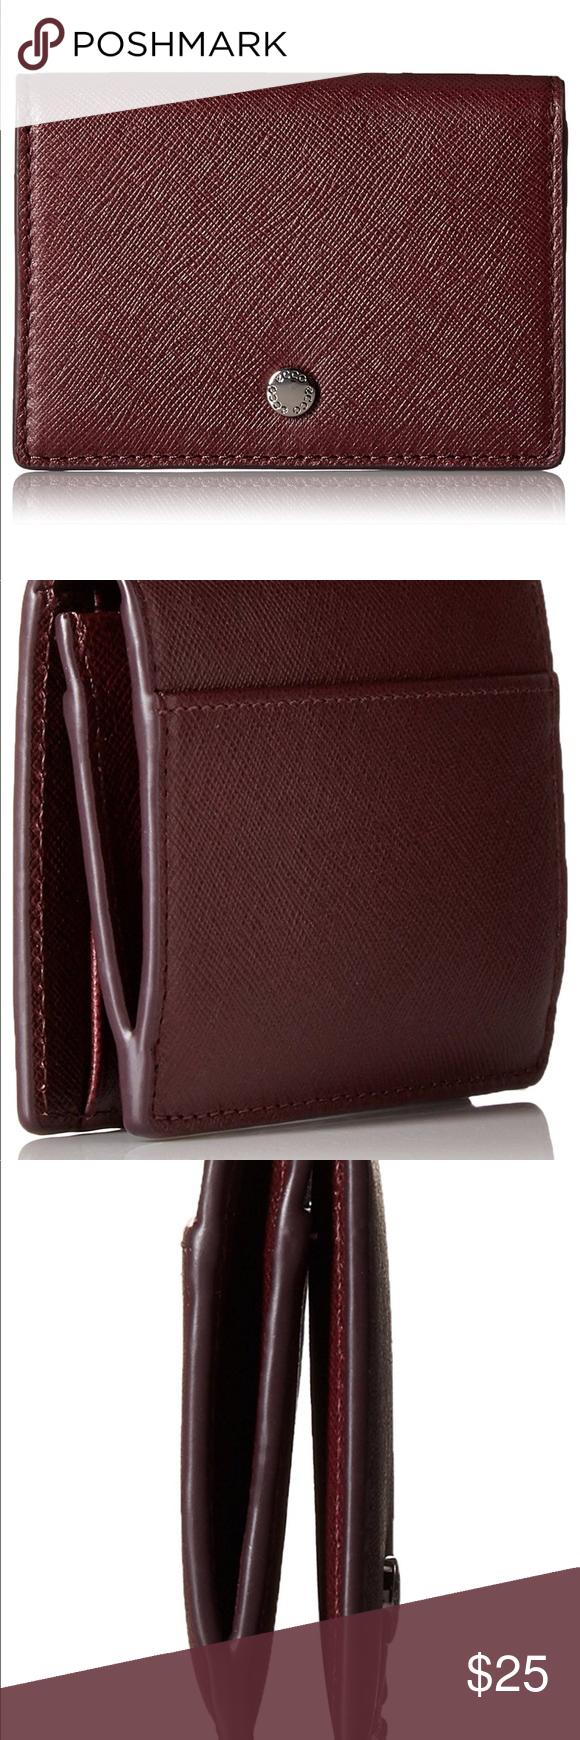 fceeb4d9ad Ecco Iola Card Case Credit Card Holder Great for small purses. Ecco ...